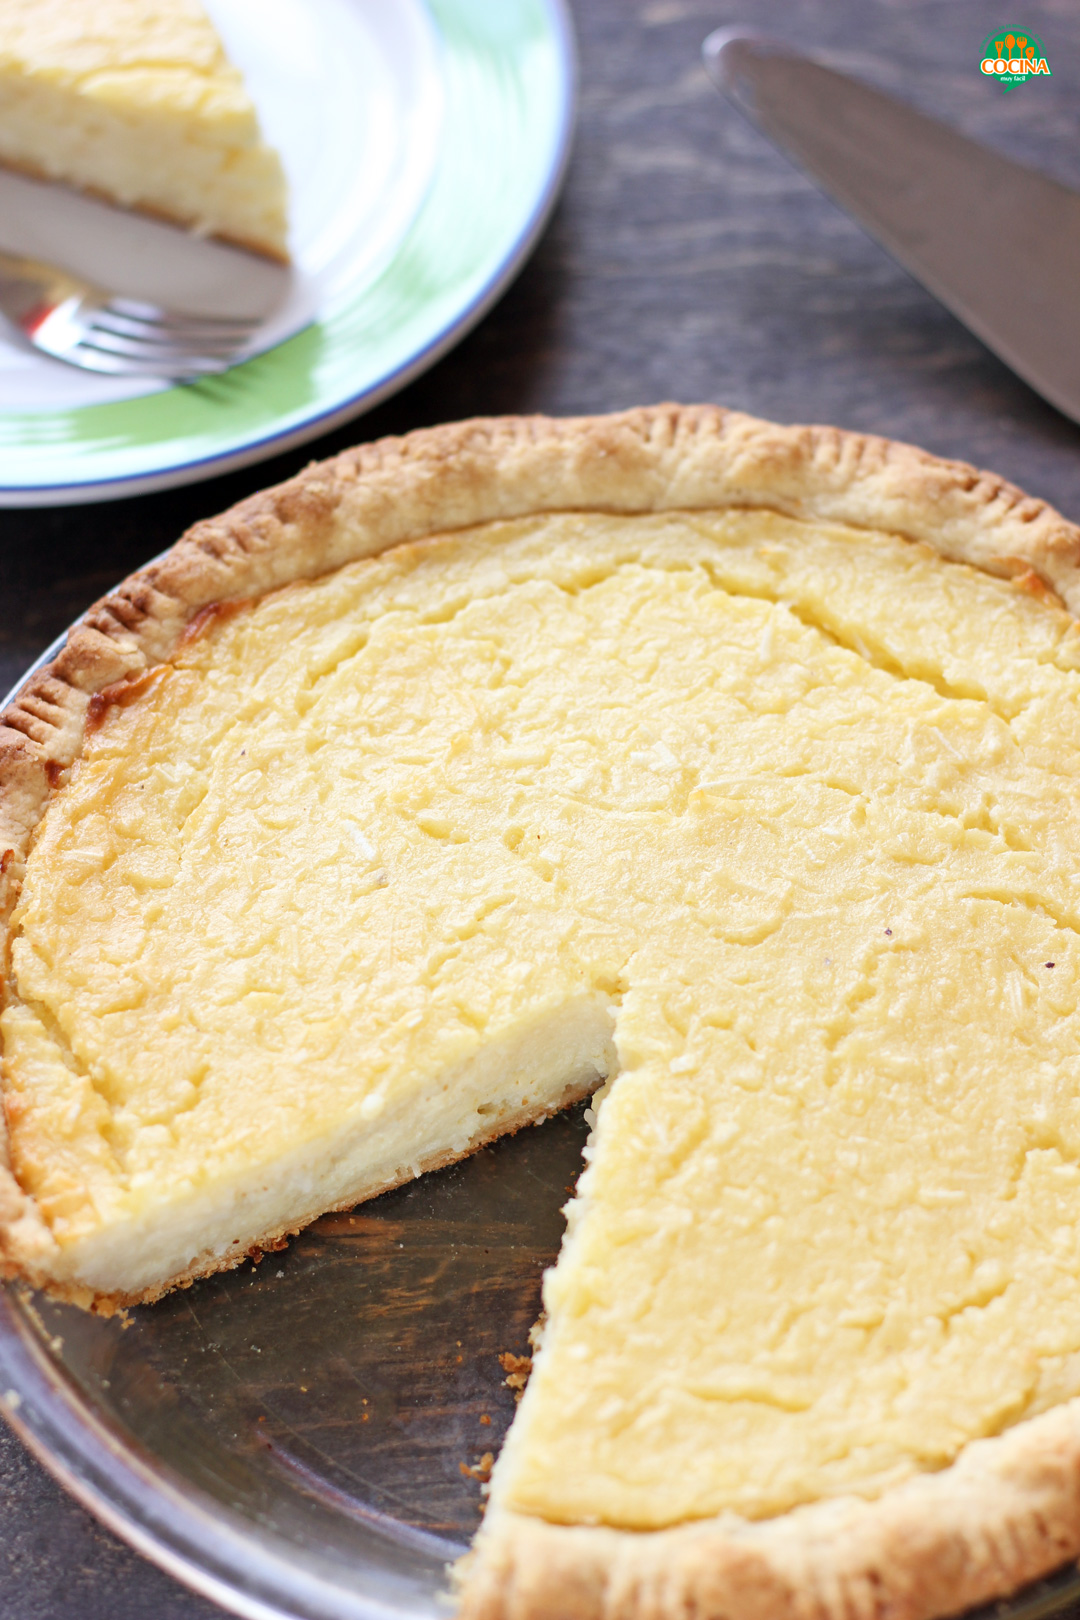 Tarta de coco o Pay de coco   cocinamuyfacil.com